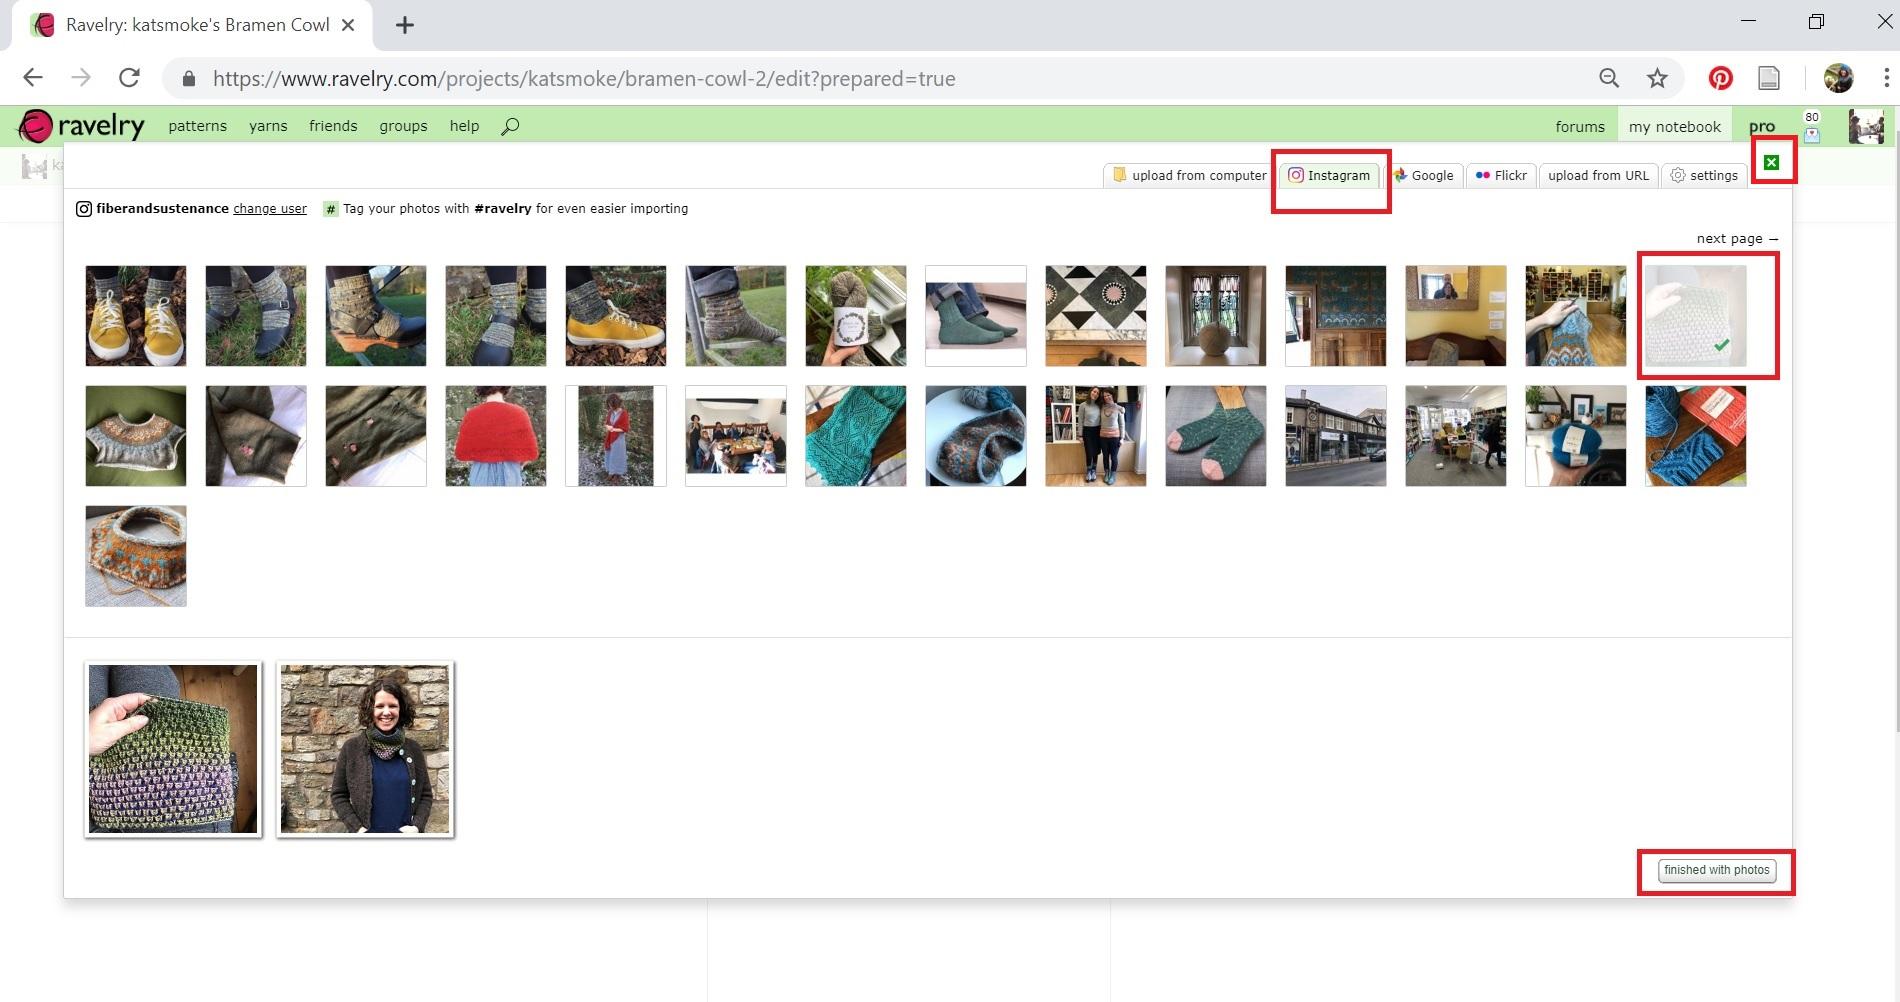 adding photo 4.jpg